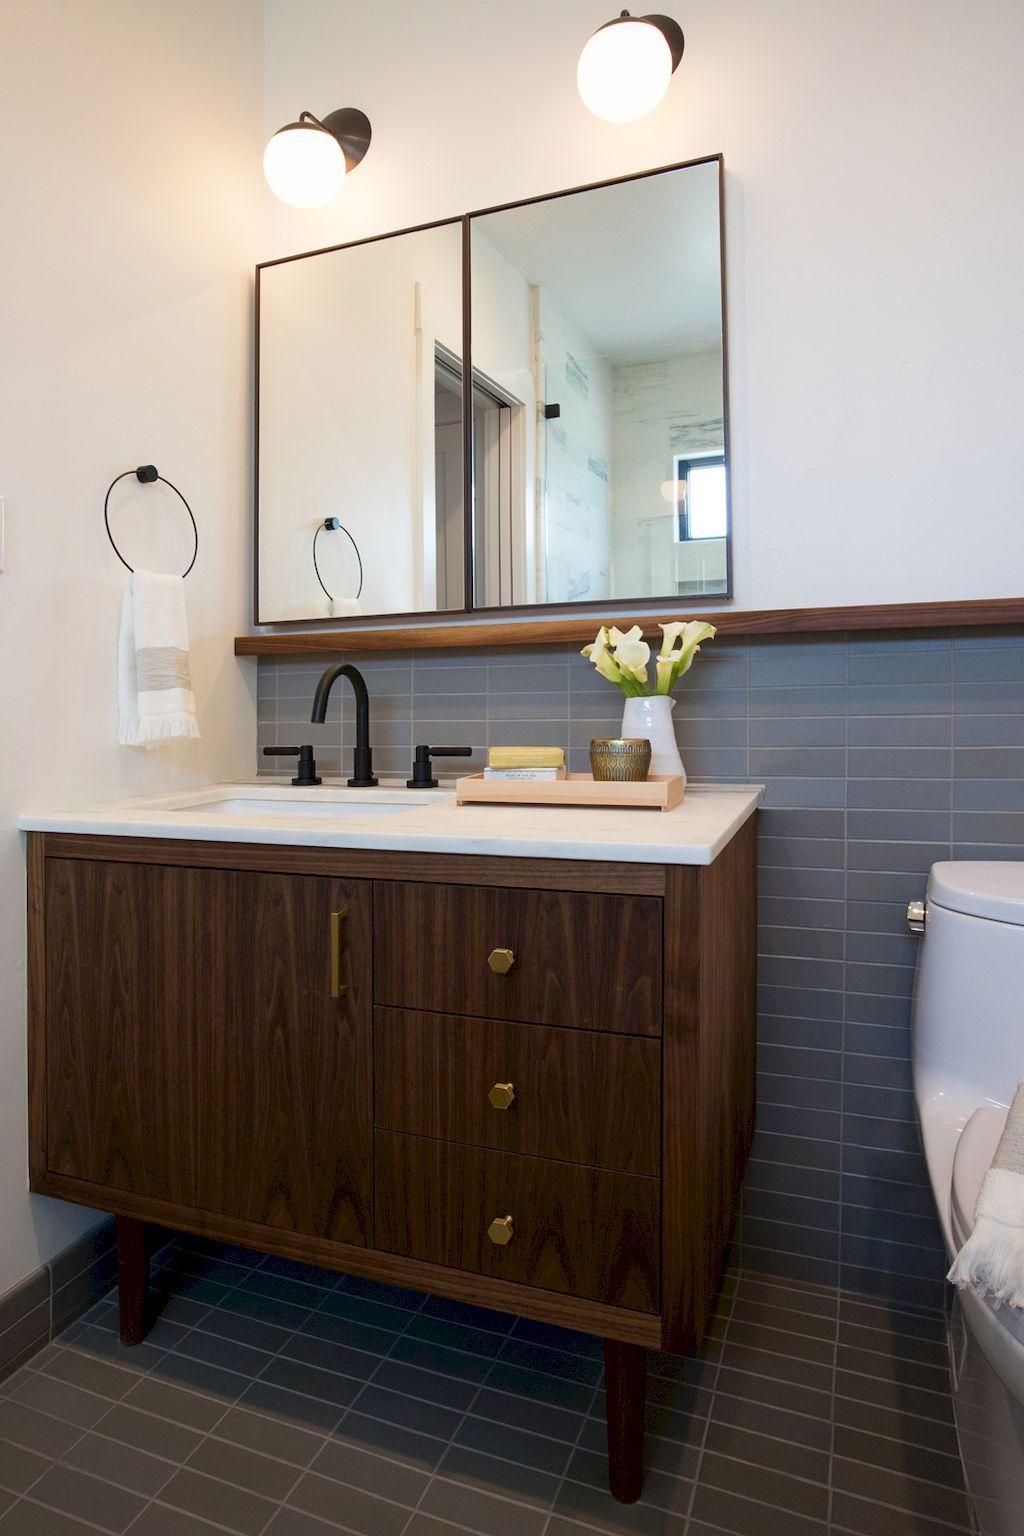 Home Art Bathroom Design Decor Mid Century Bathroom Modern Bedroom Decor